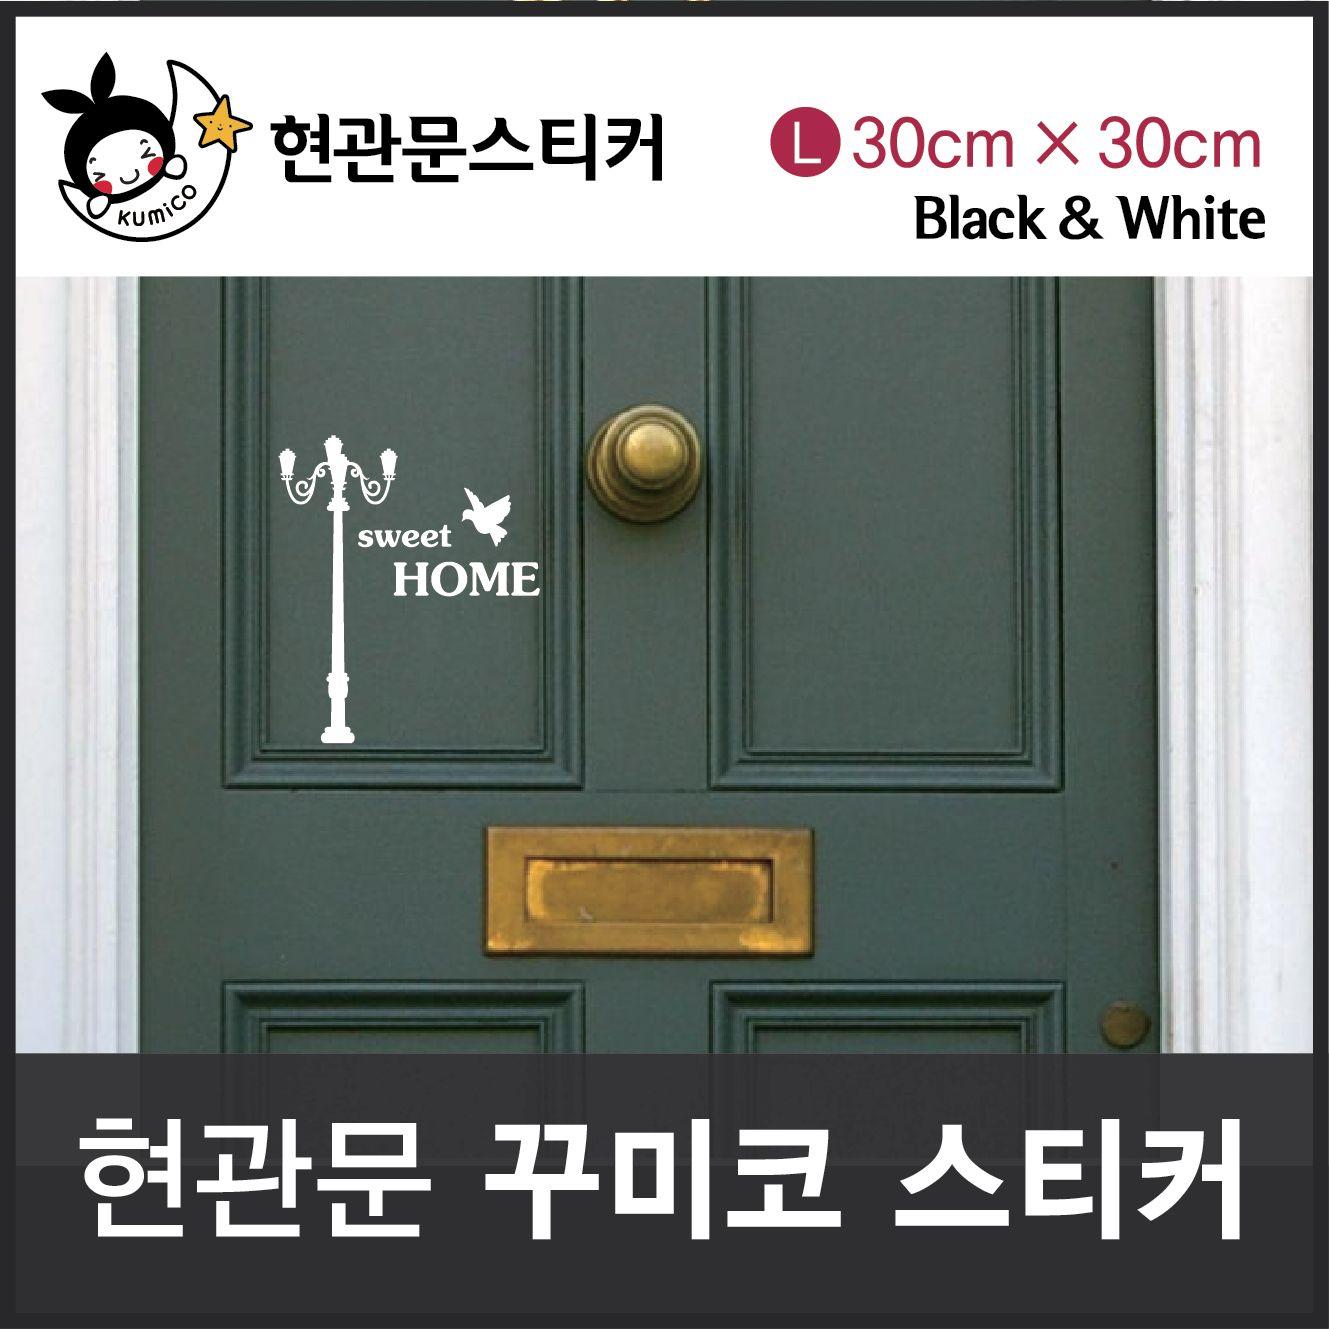 Sweet HOME 현관문 스티커(꾸미코)  Size L: 30cm x 30cm